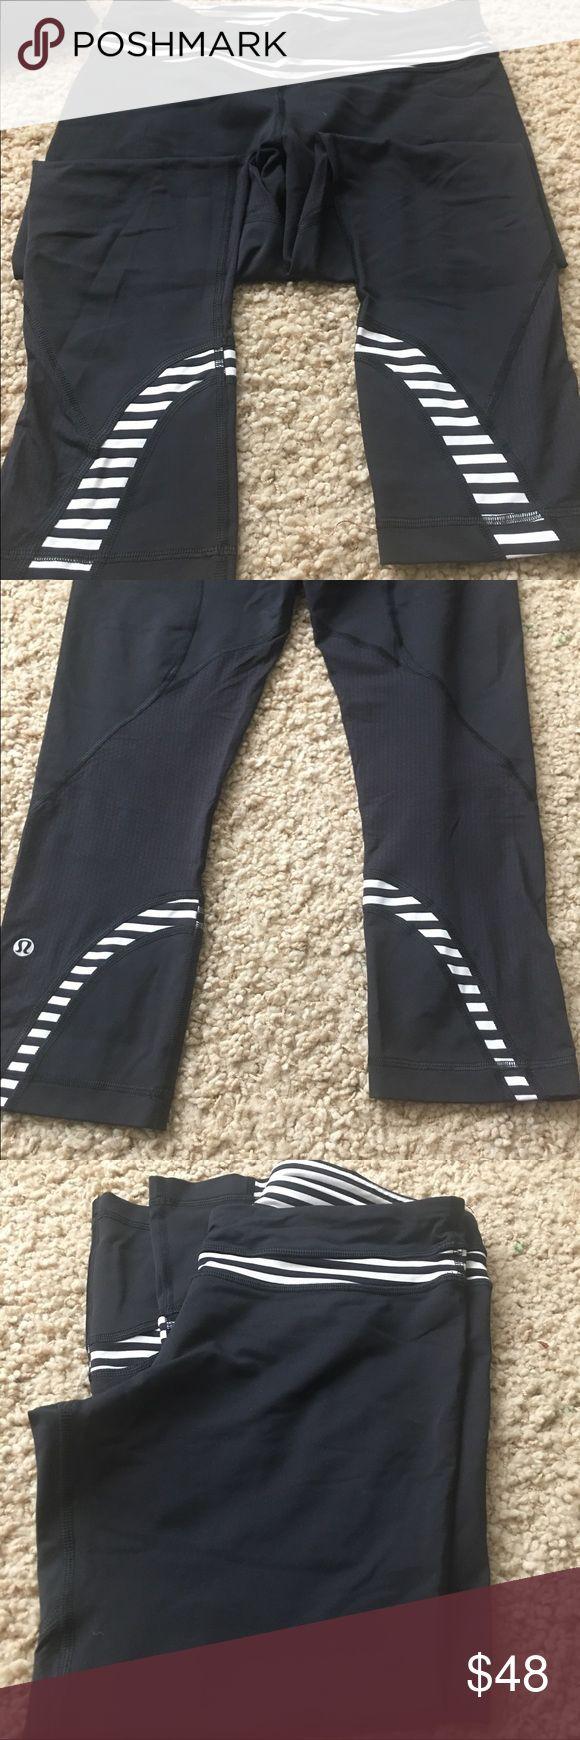 Lulu pants Lulu pants as is!  No tears rips!  Picture is true to condition. Run inspire pants lululemon athletica Pants Leggings